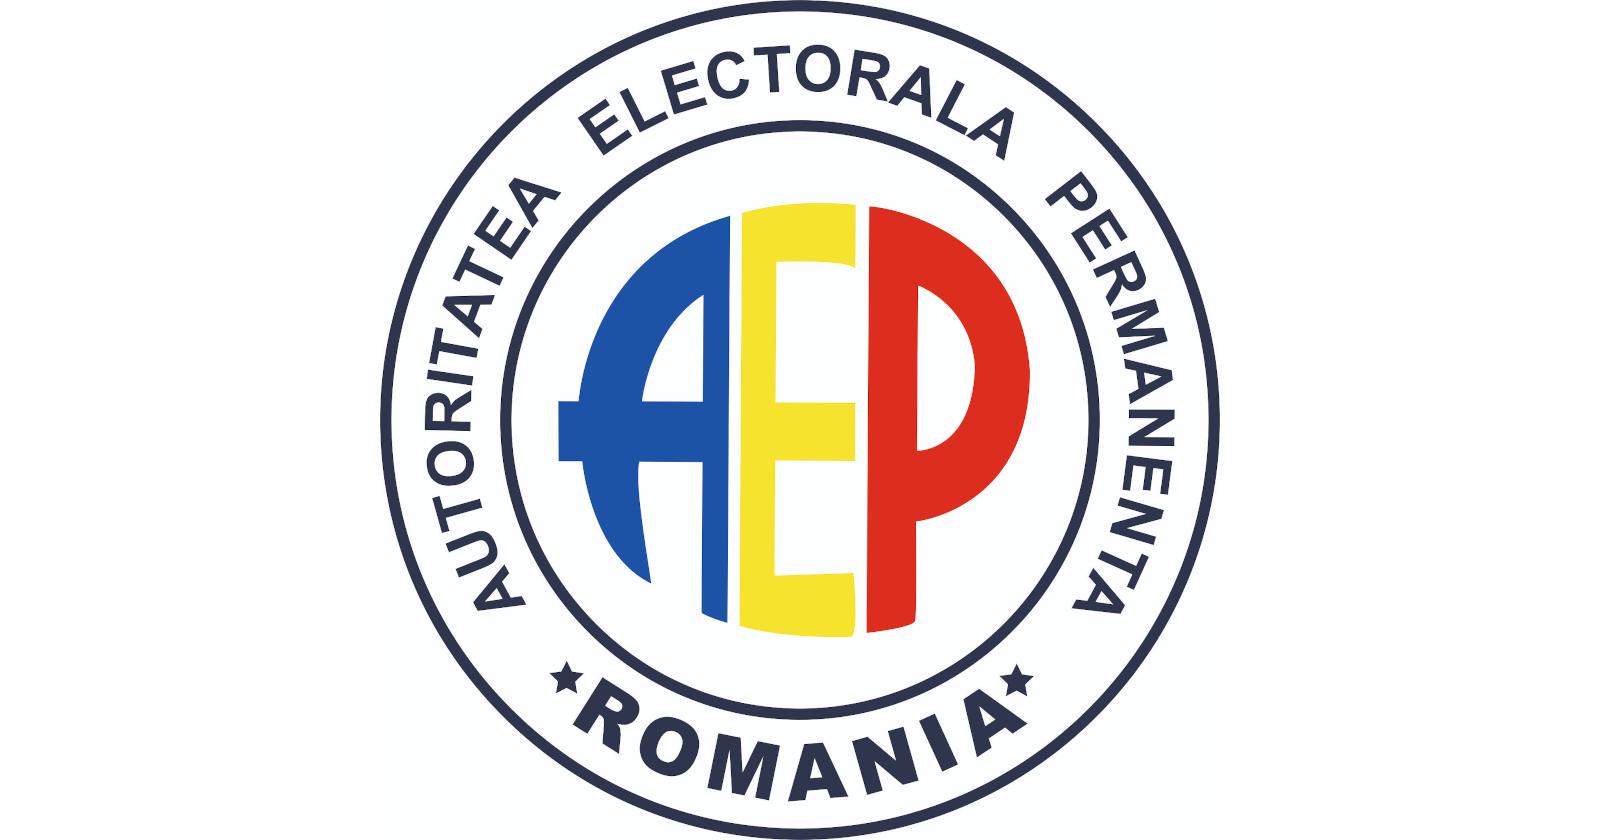 https://ziarul.romania-rationala.ro/control/articole/articole/autoritatea-electorala-permanenta_5.jpg